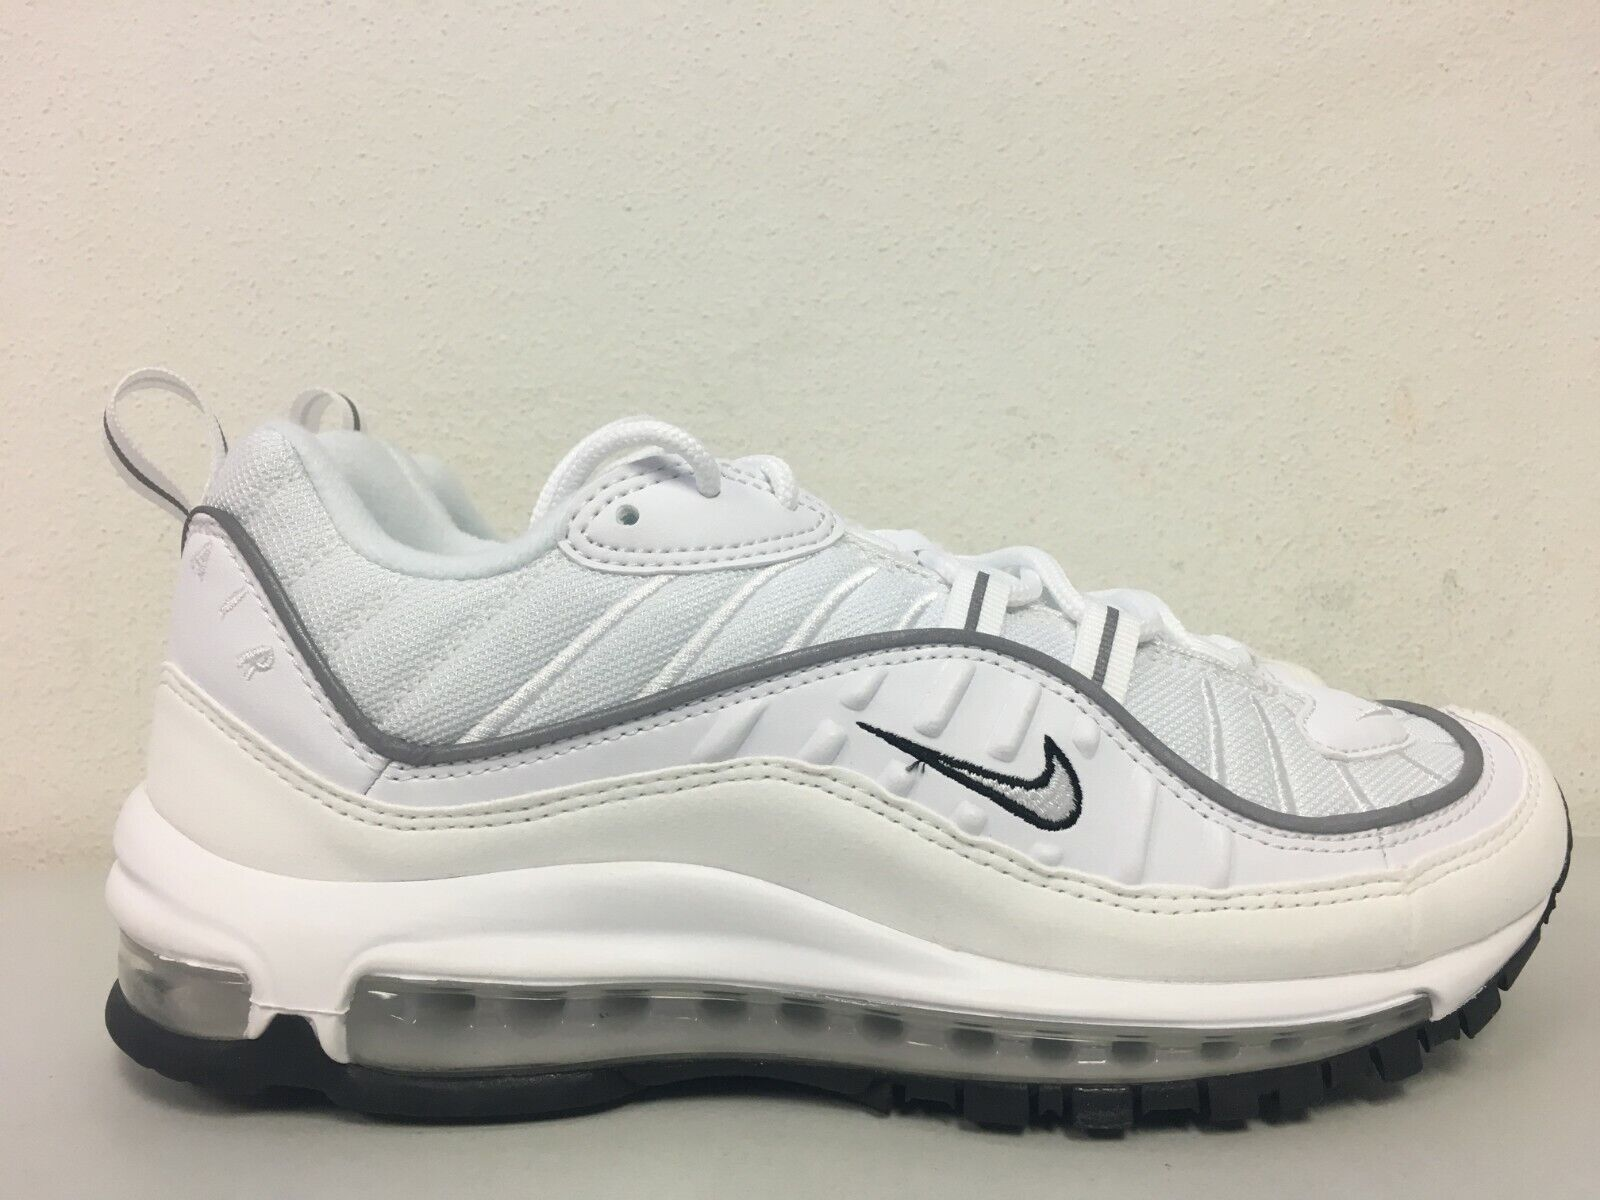 Nike Womens Air Max 98 White Reflect Silver AH6799 103 Size 9.5